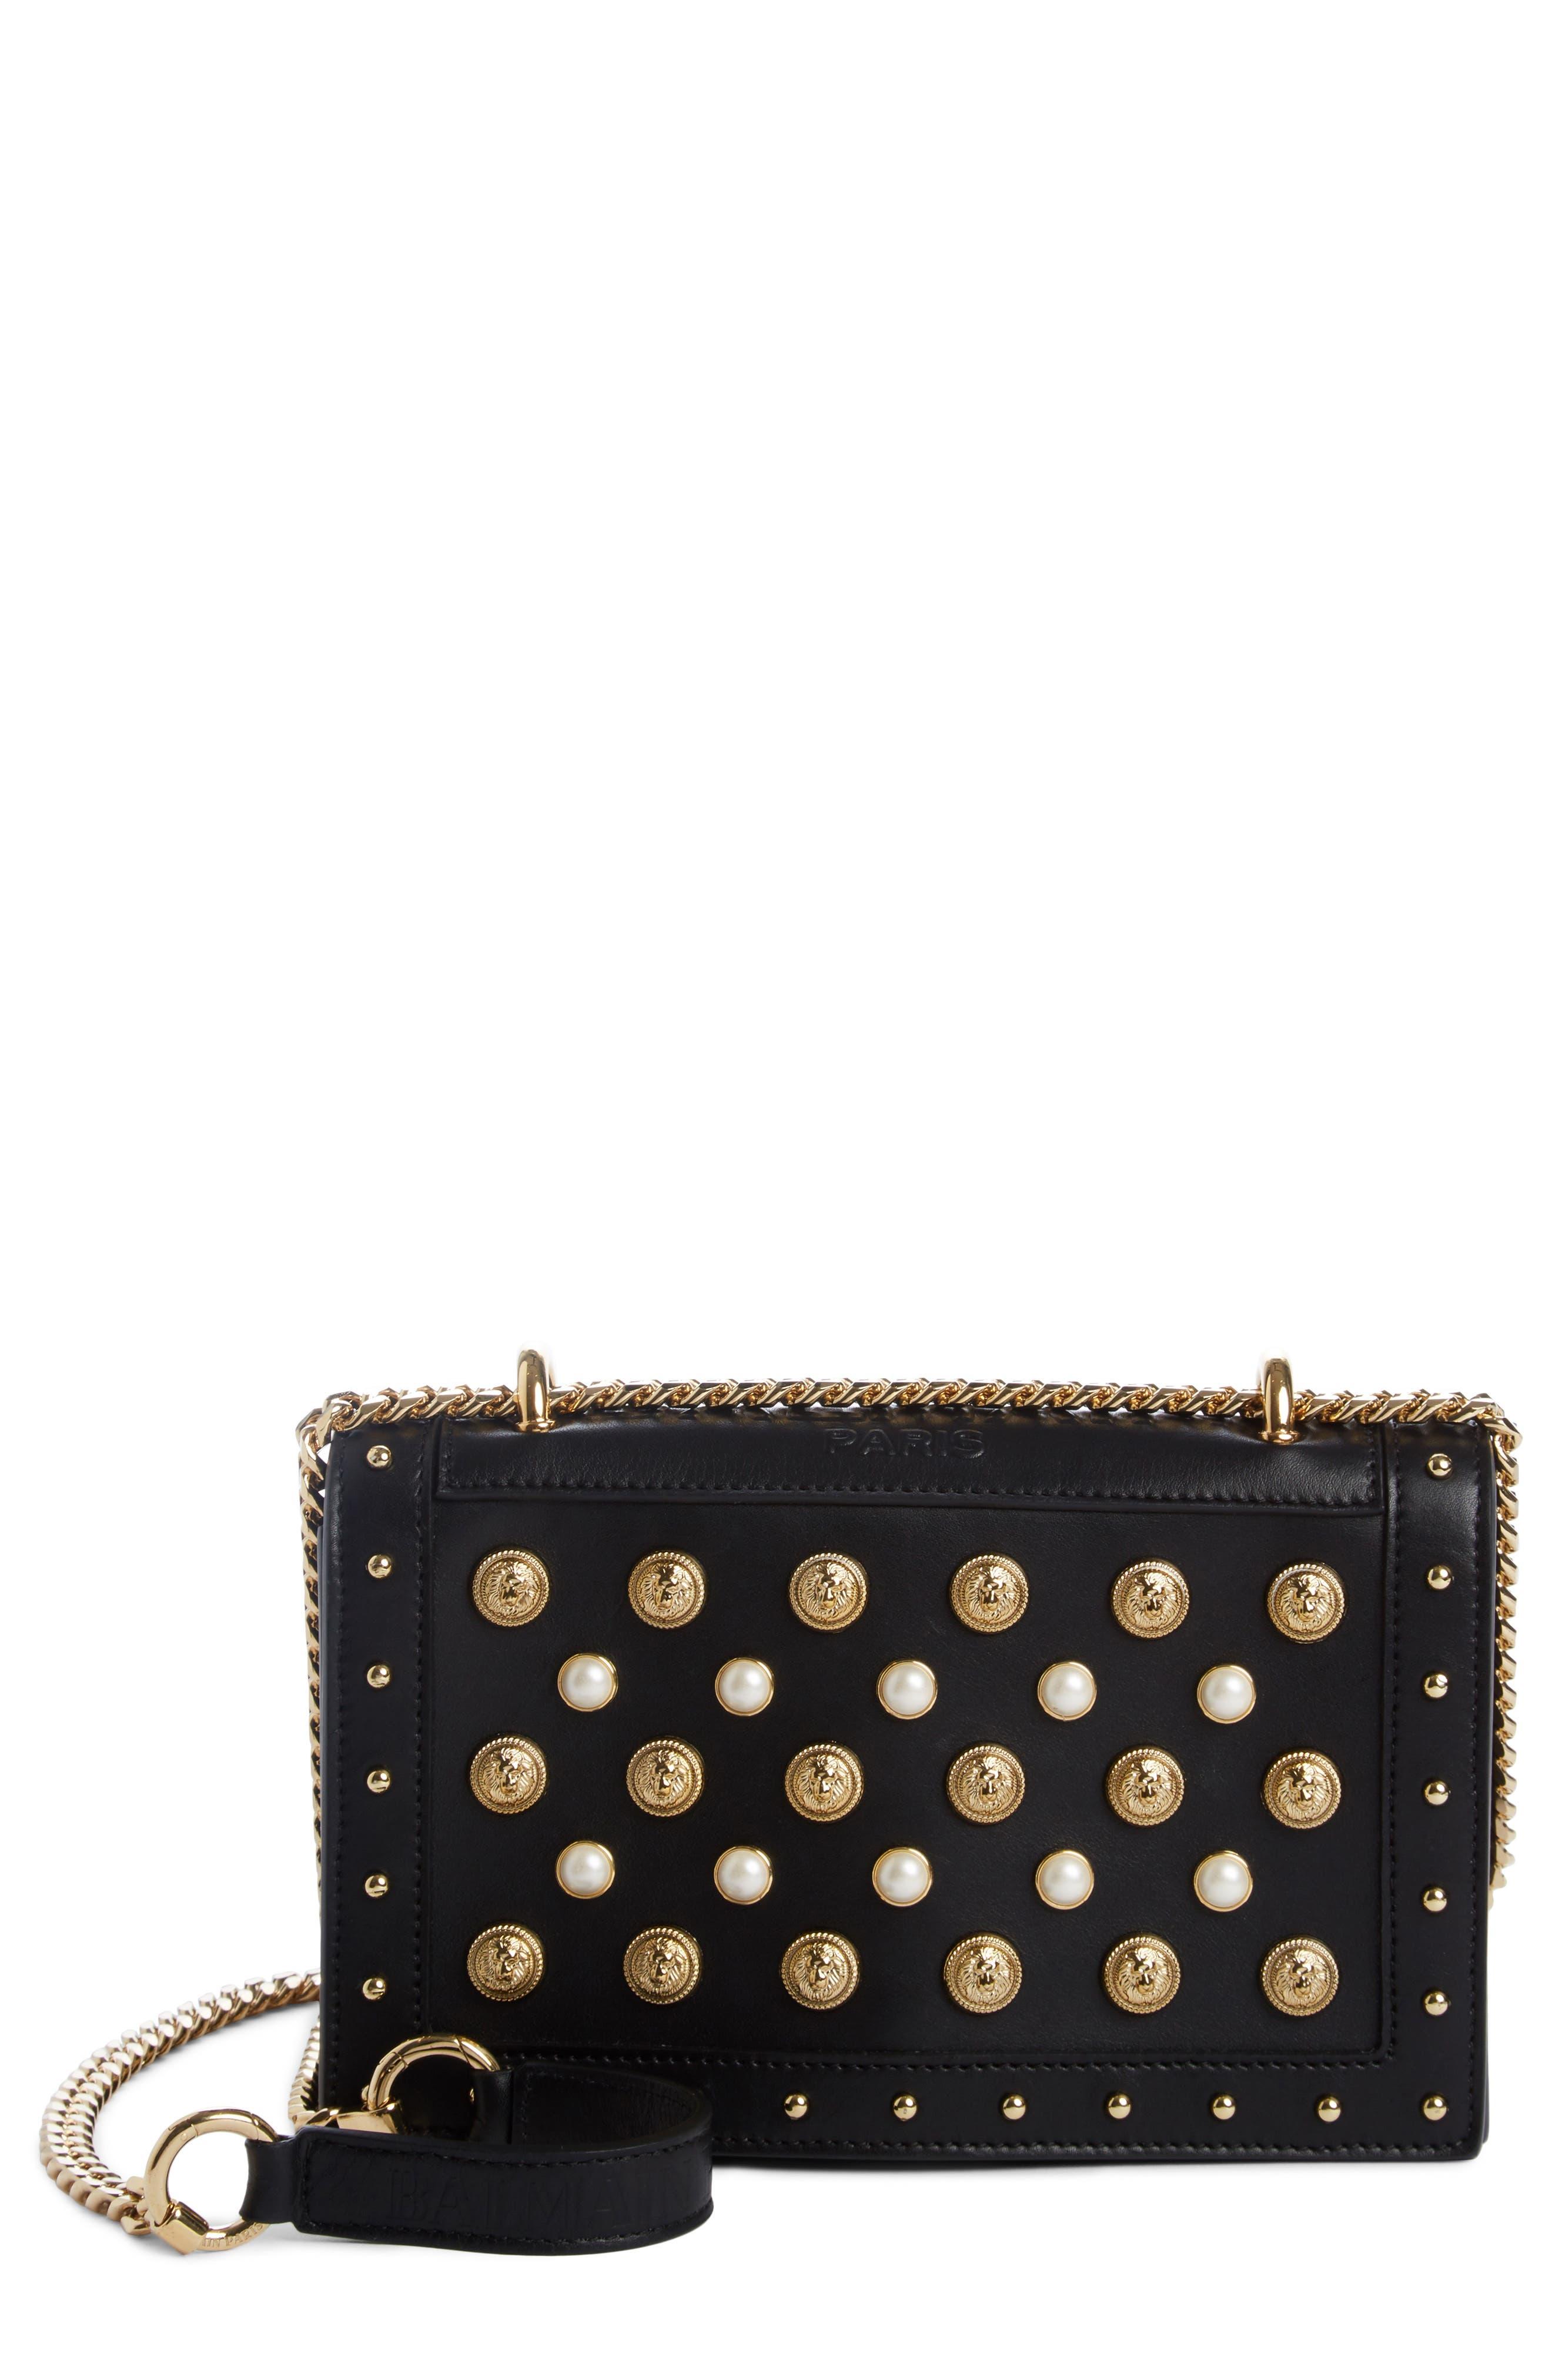 Main Image - Balmain Love Studded Leather Shoulder Bag